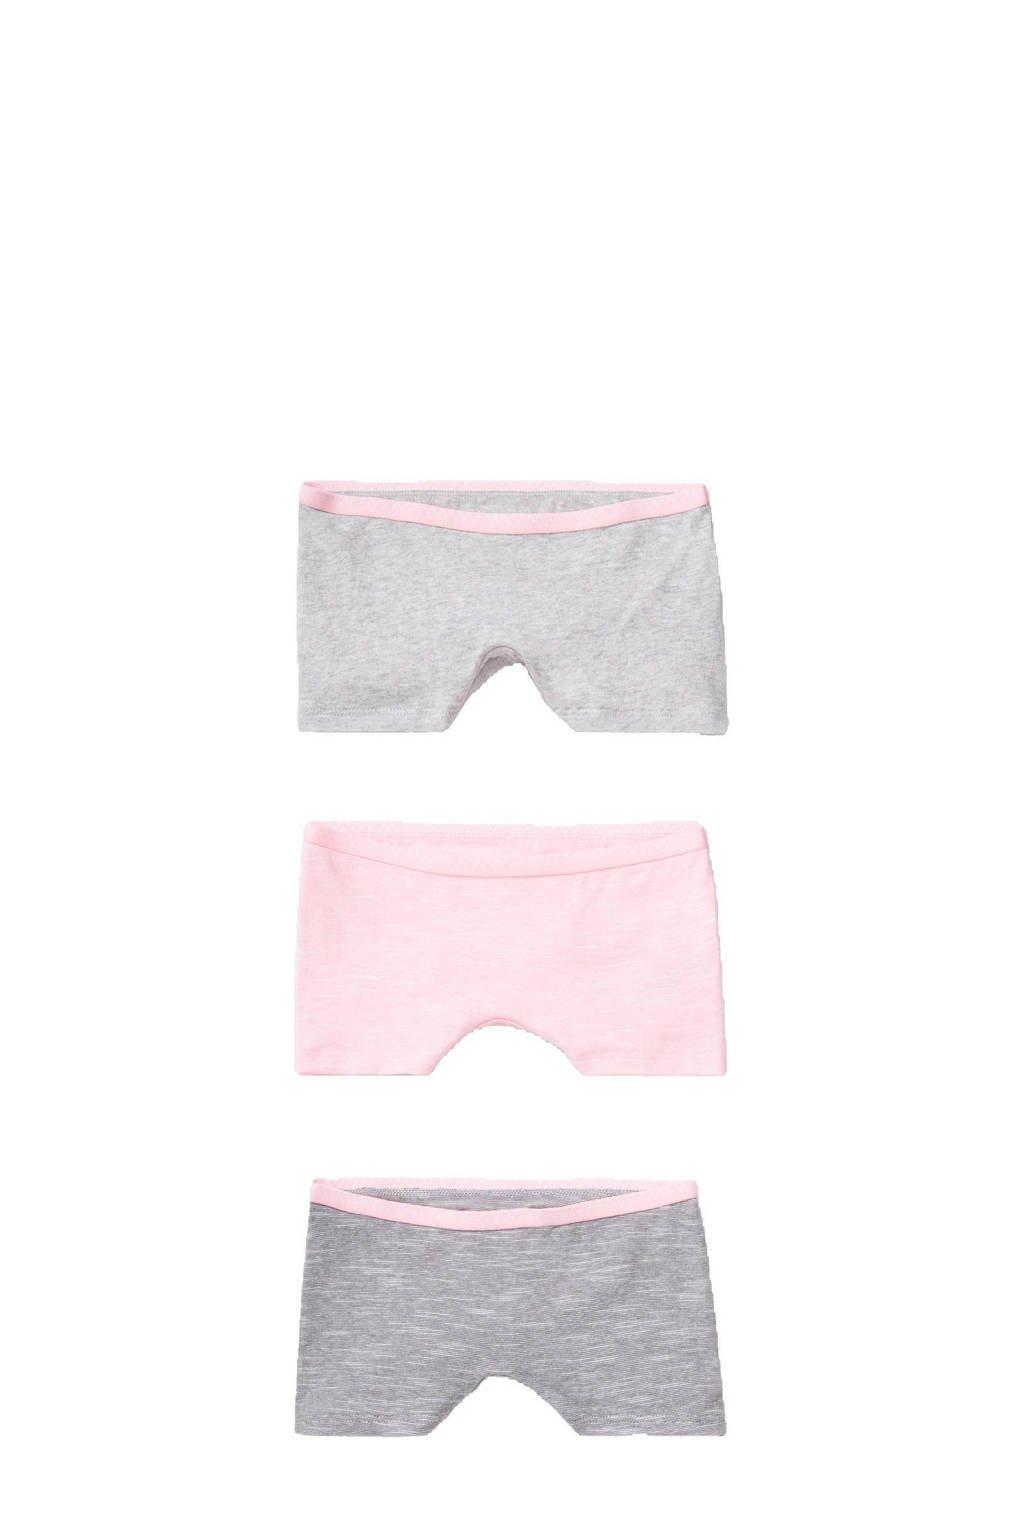 C&A Here & There boxershorts - set van 3 grijs/roze, Grijs/roze